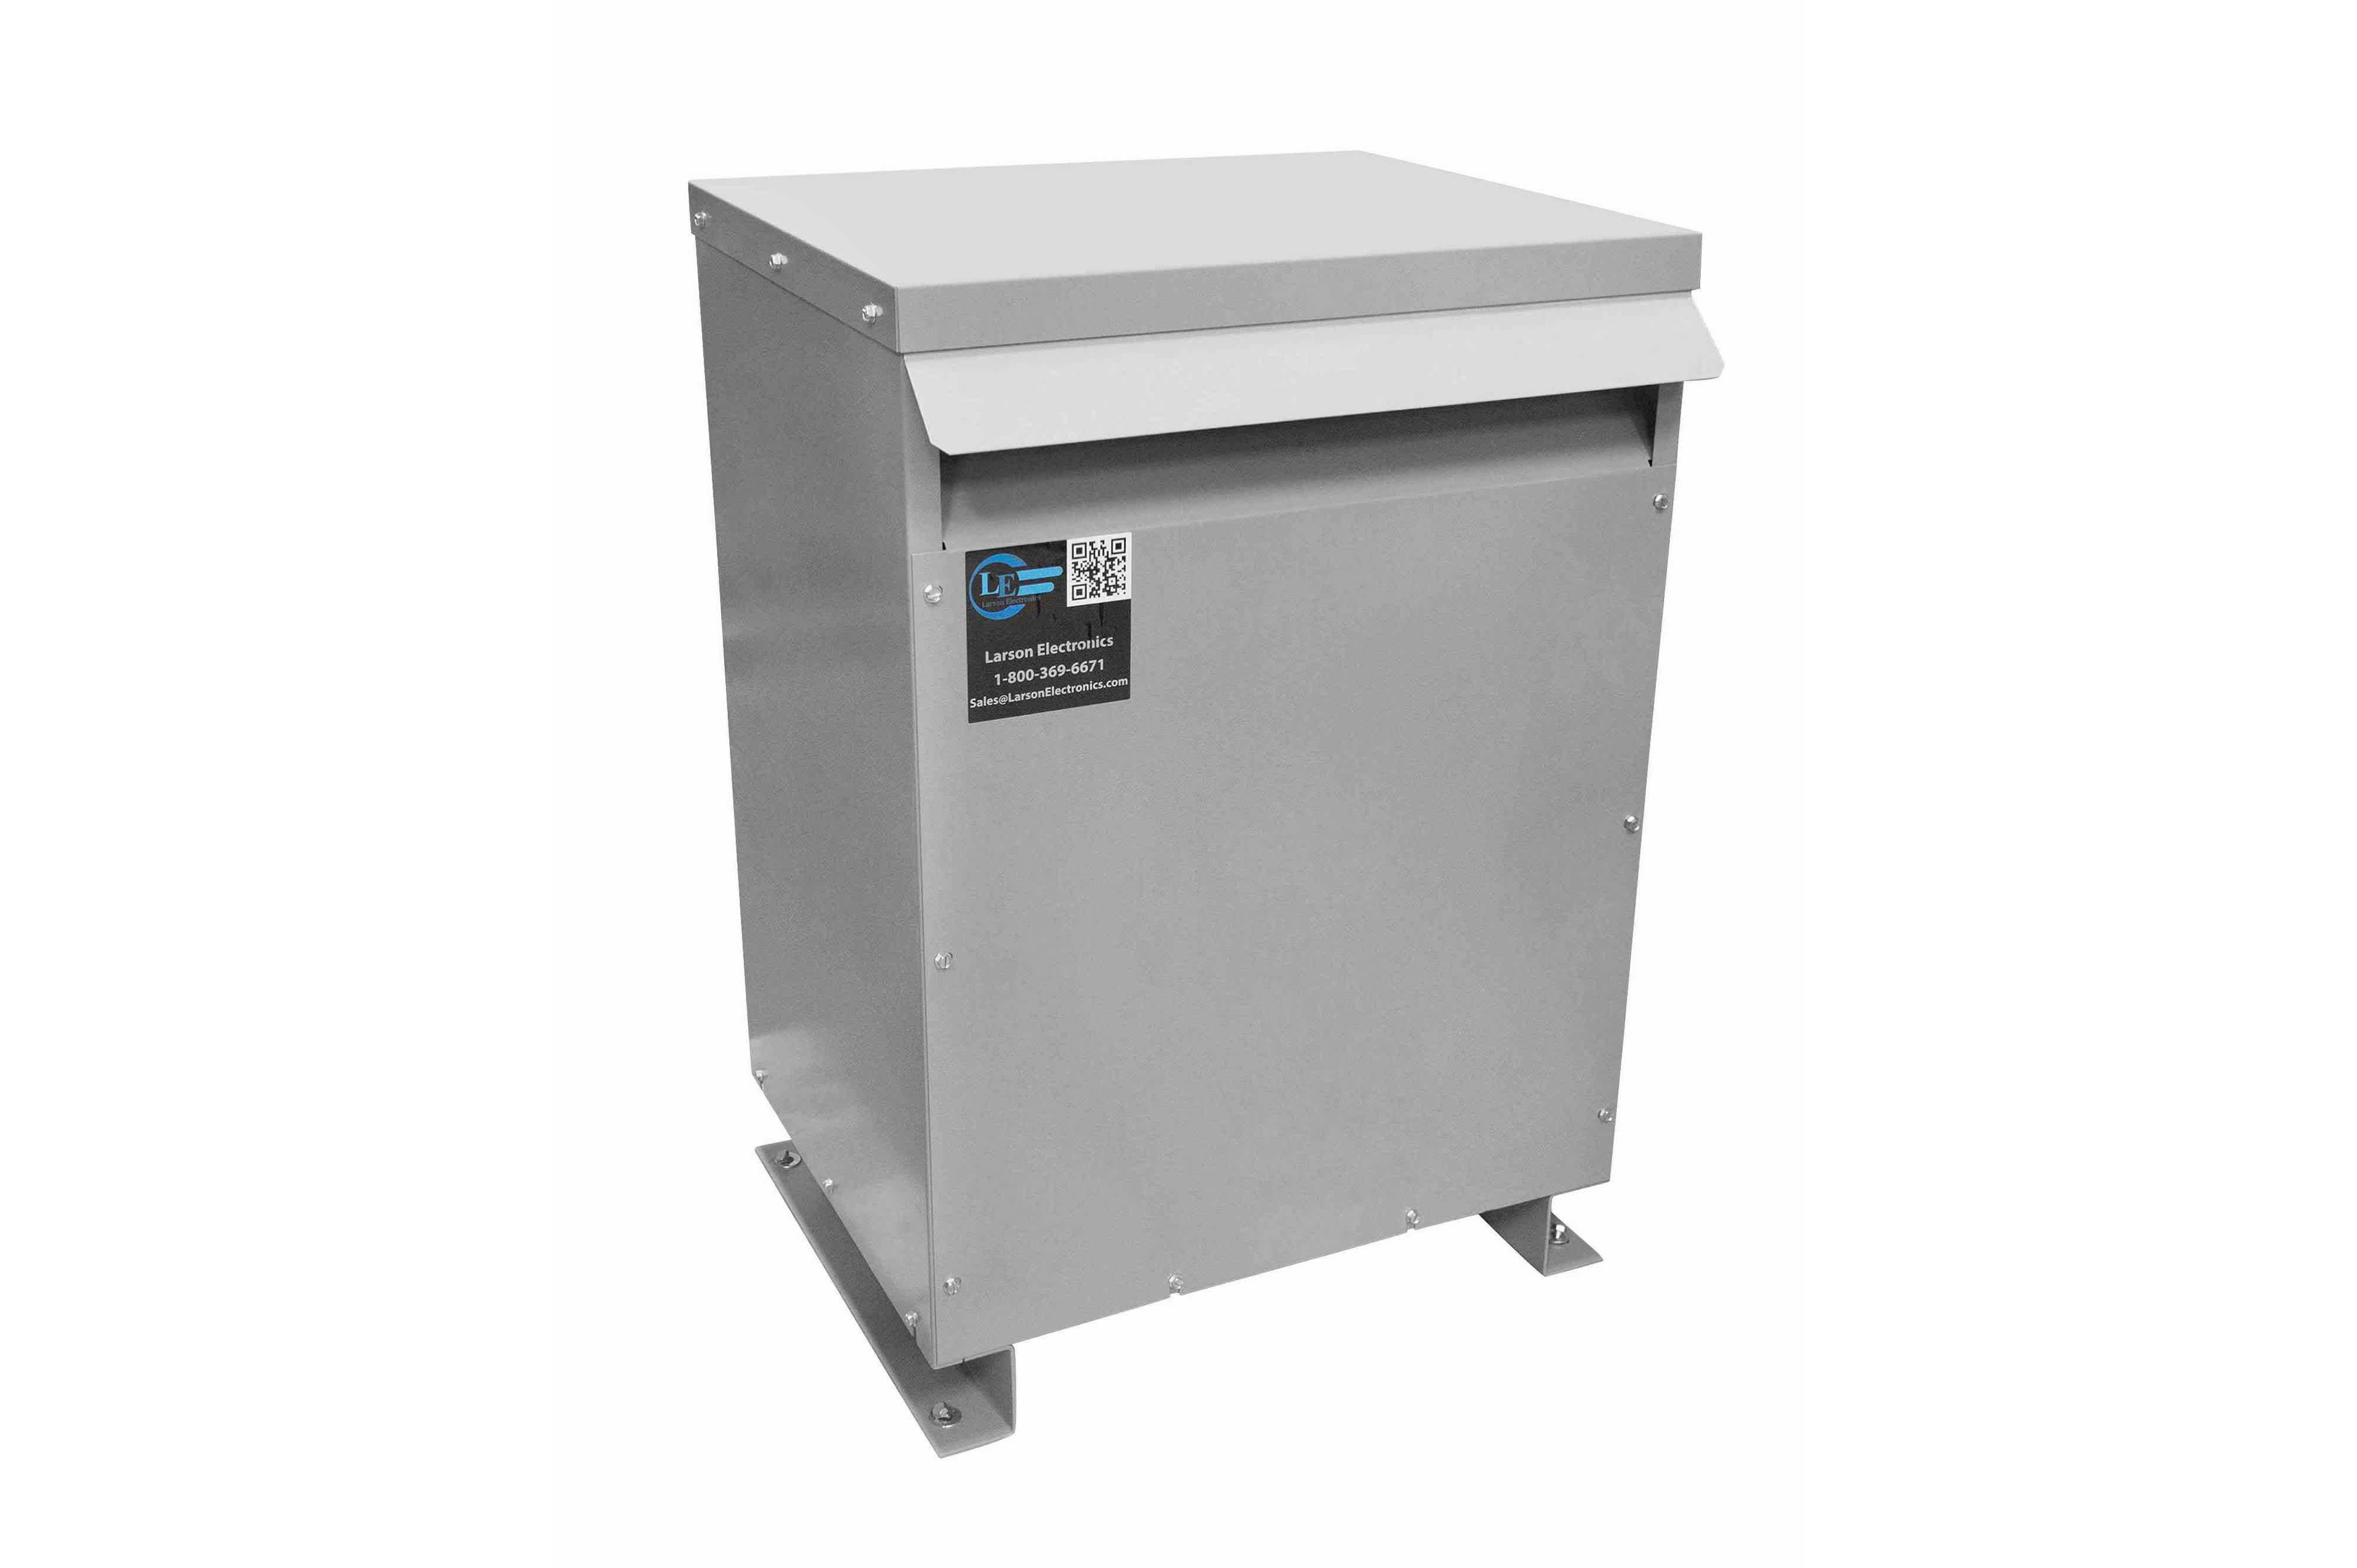 40 kVA 3PH Isolation Transformer, 380V Wye Primary, 480Y/277 Wye-N Secondary, N3R, Ventilated, 60 Hz